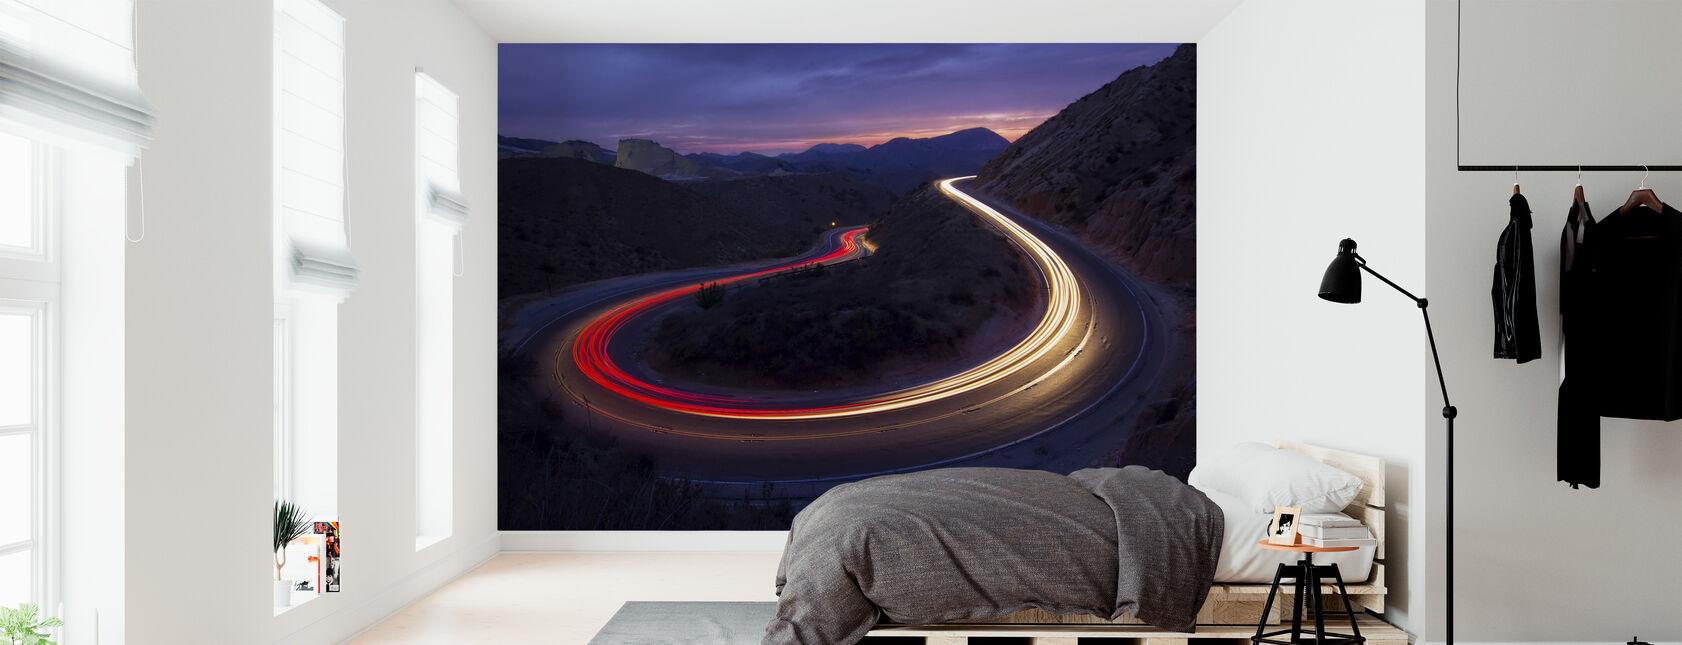 Headlights and Brake Lights - Wallpaper - Bedroom